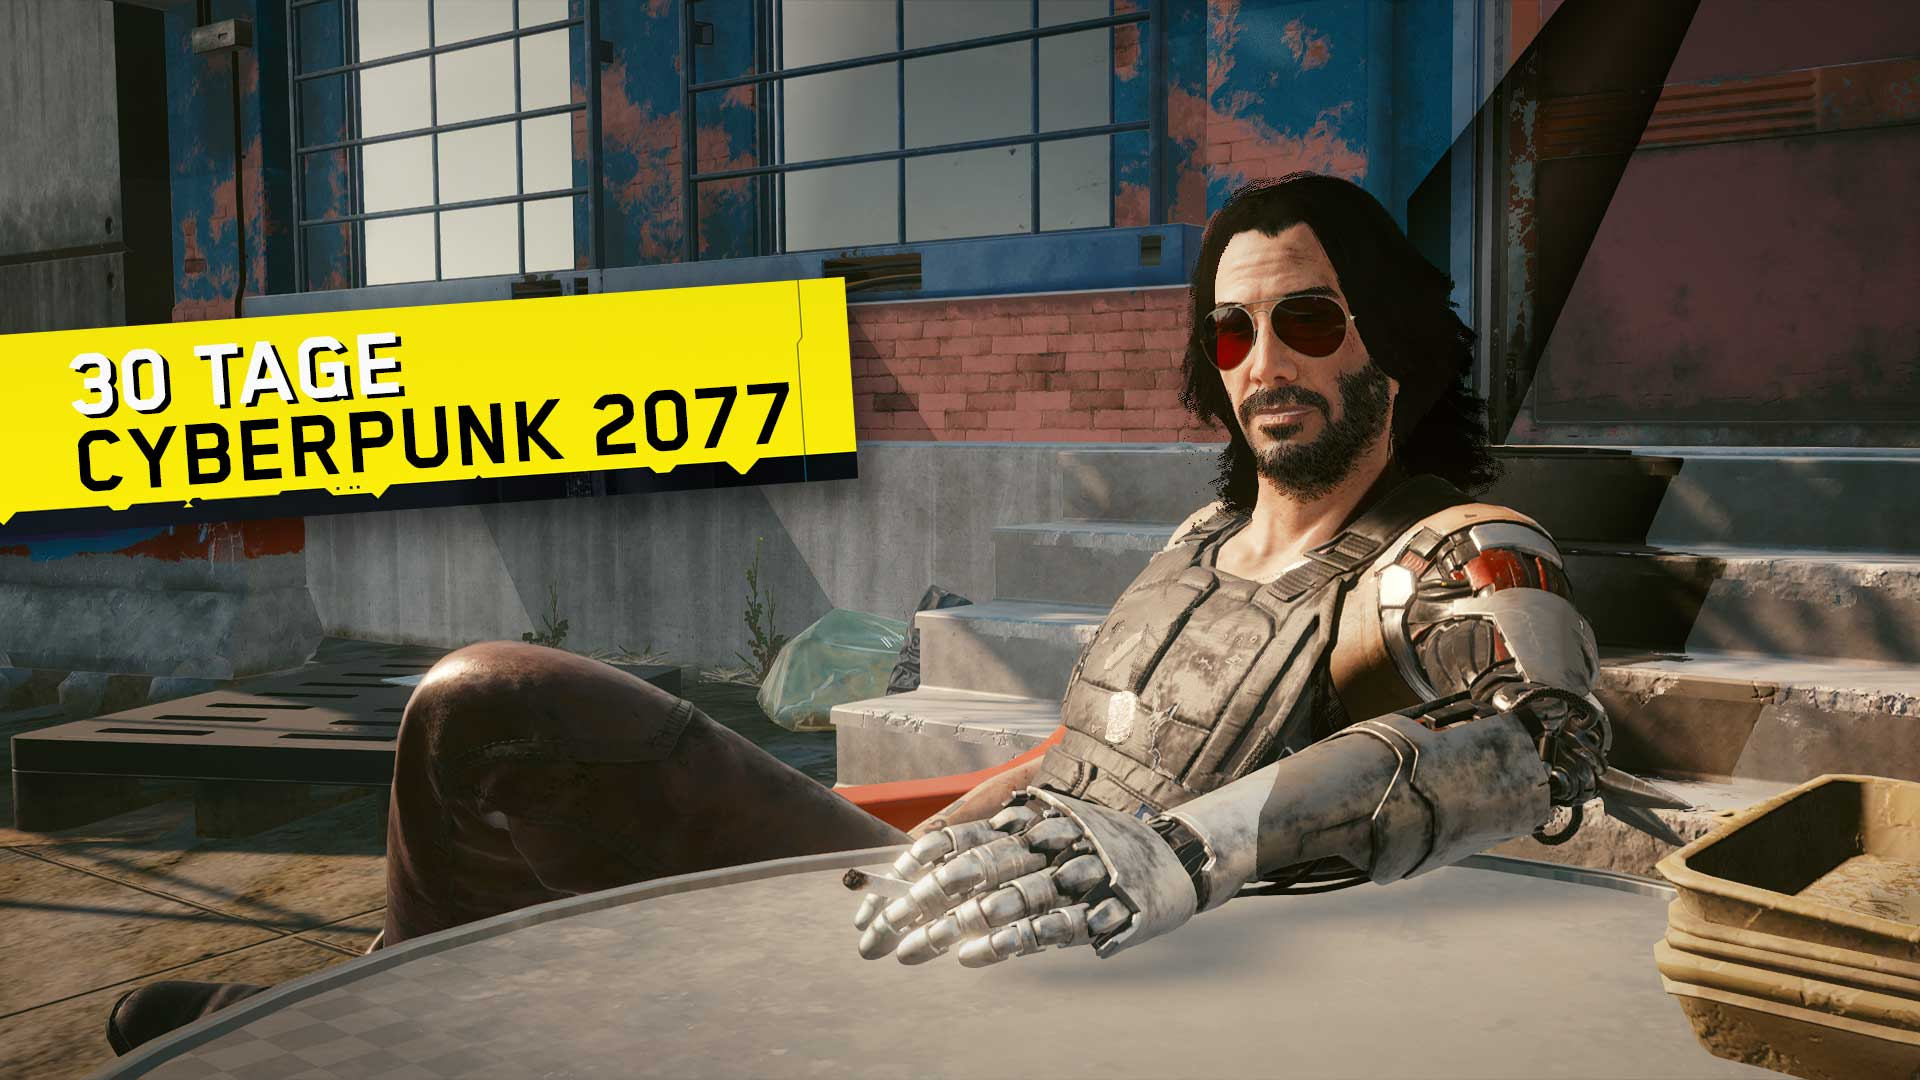 30 tage cyberpunk 2077